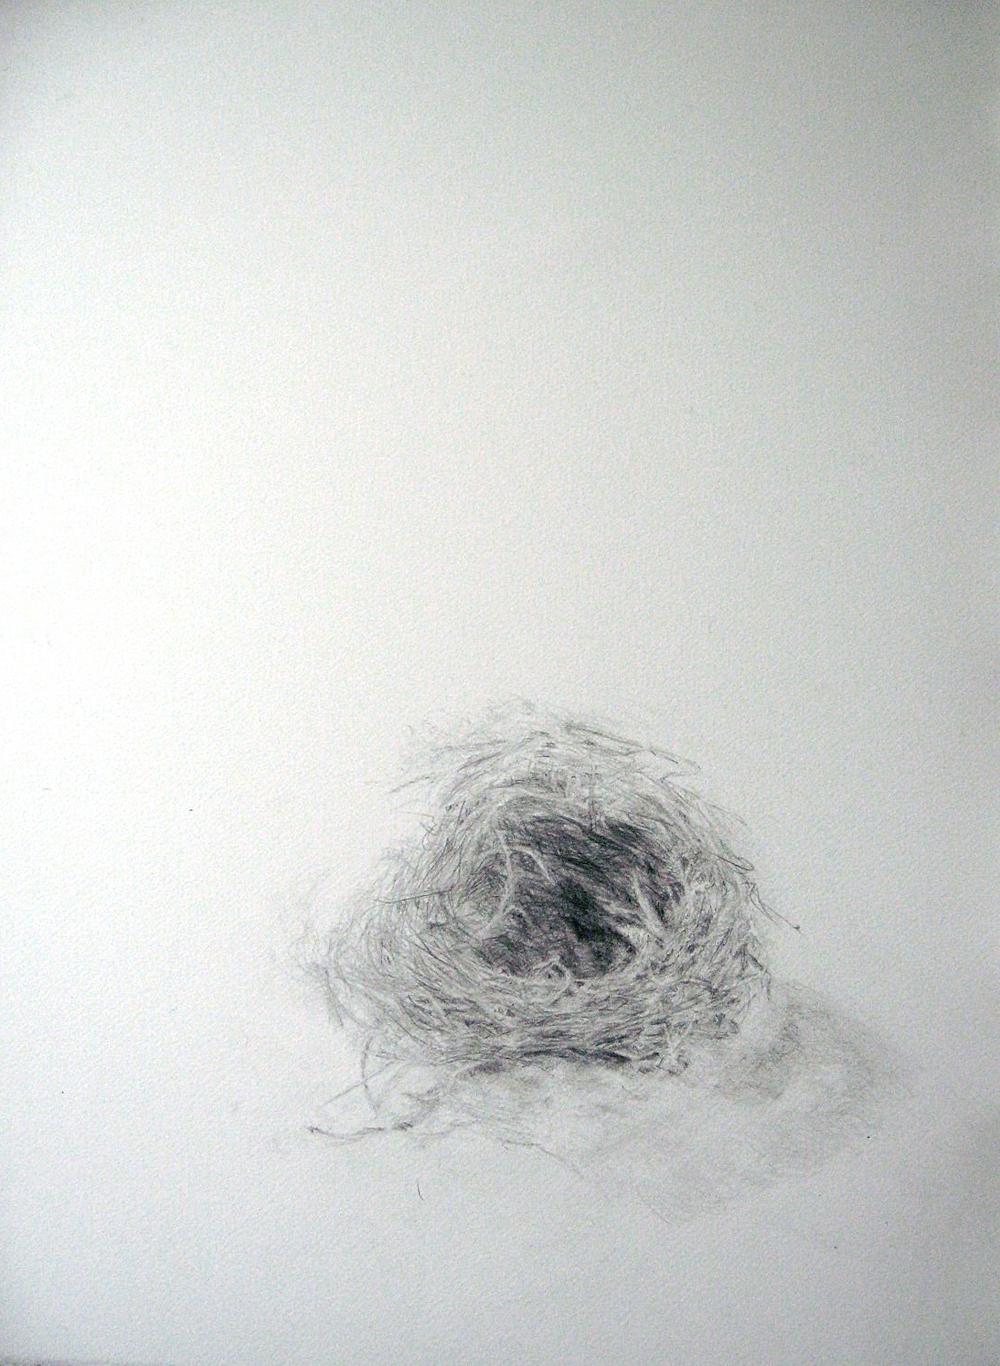 birdnest, (blackbird)